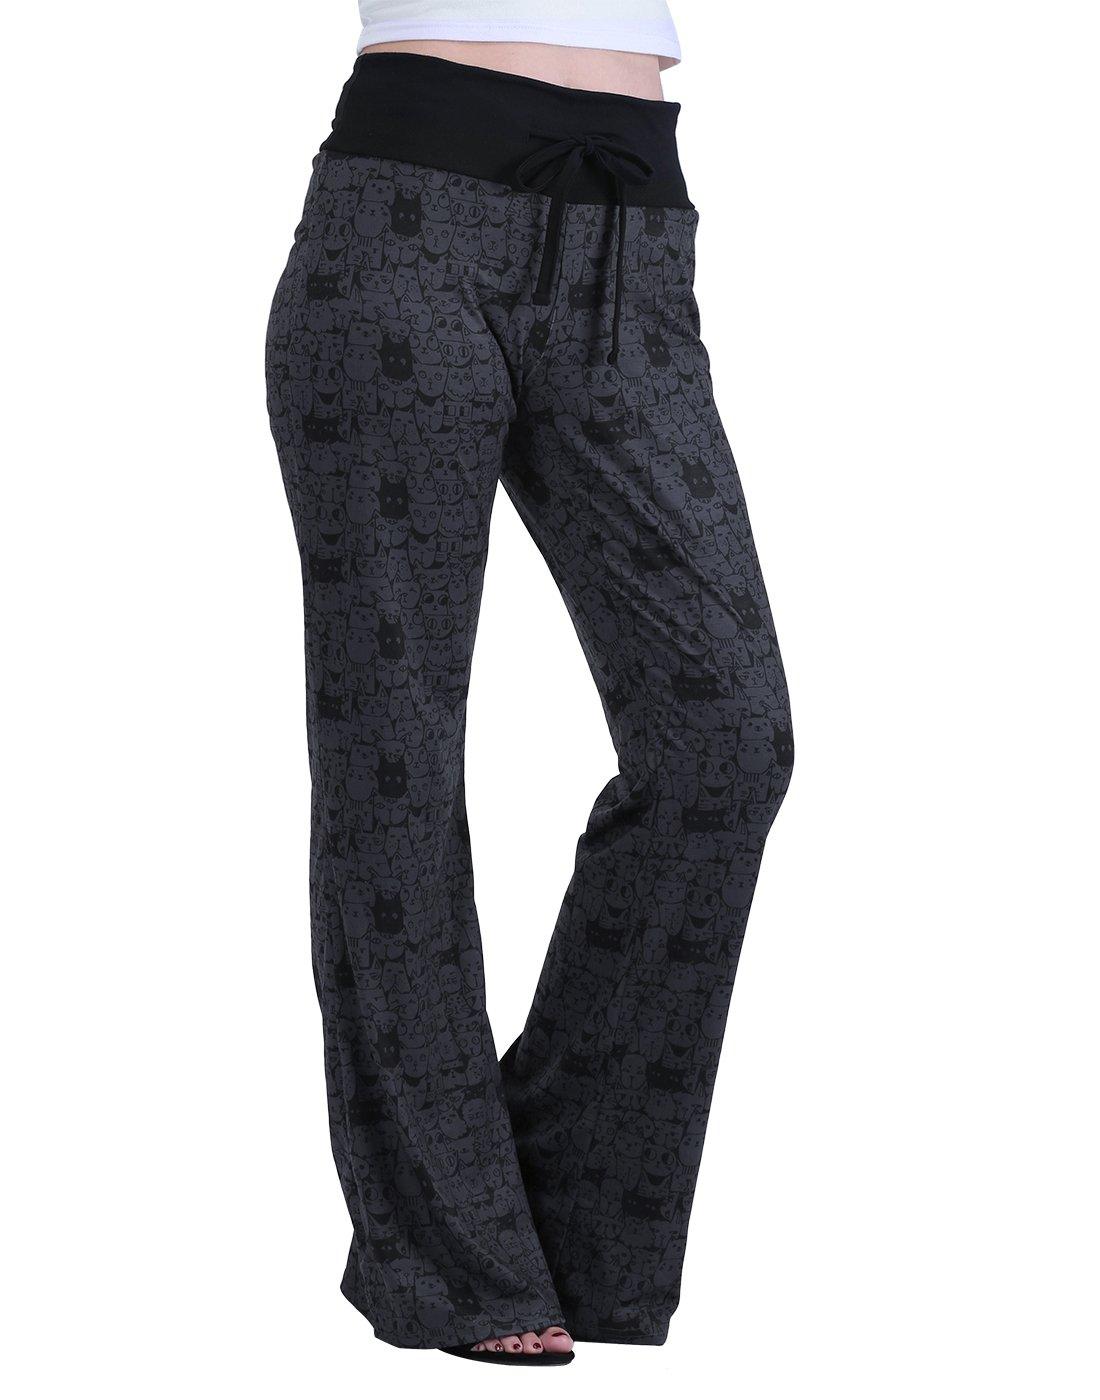 HDE Womens Cotton Pajama Pants Wide Leg Sleepwear Casual Loose Lounge PJ Bottoms,A Thousand Cats,2X Plus